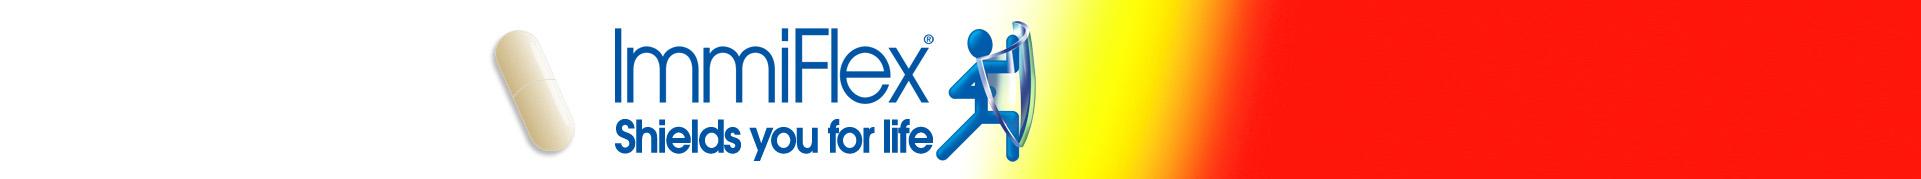 Immiflex